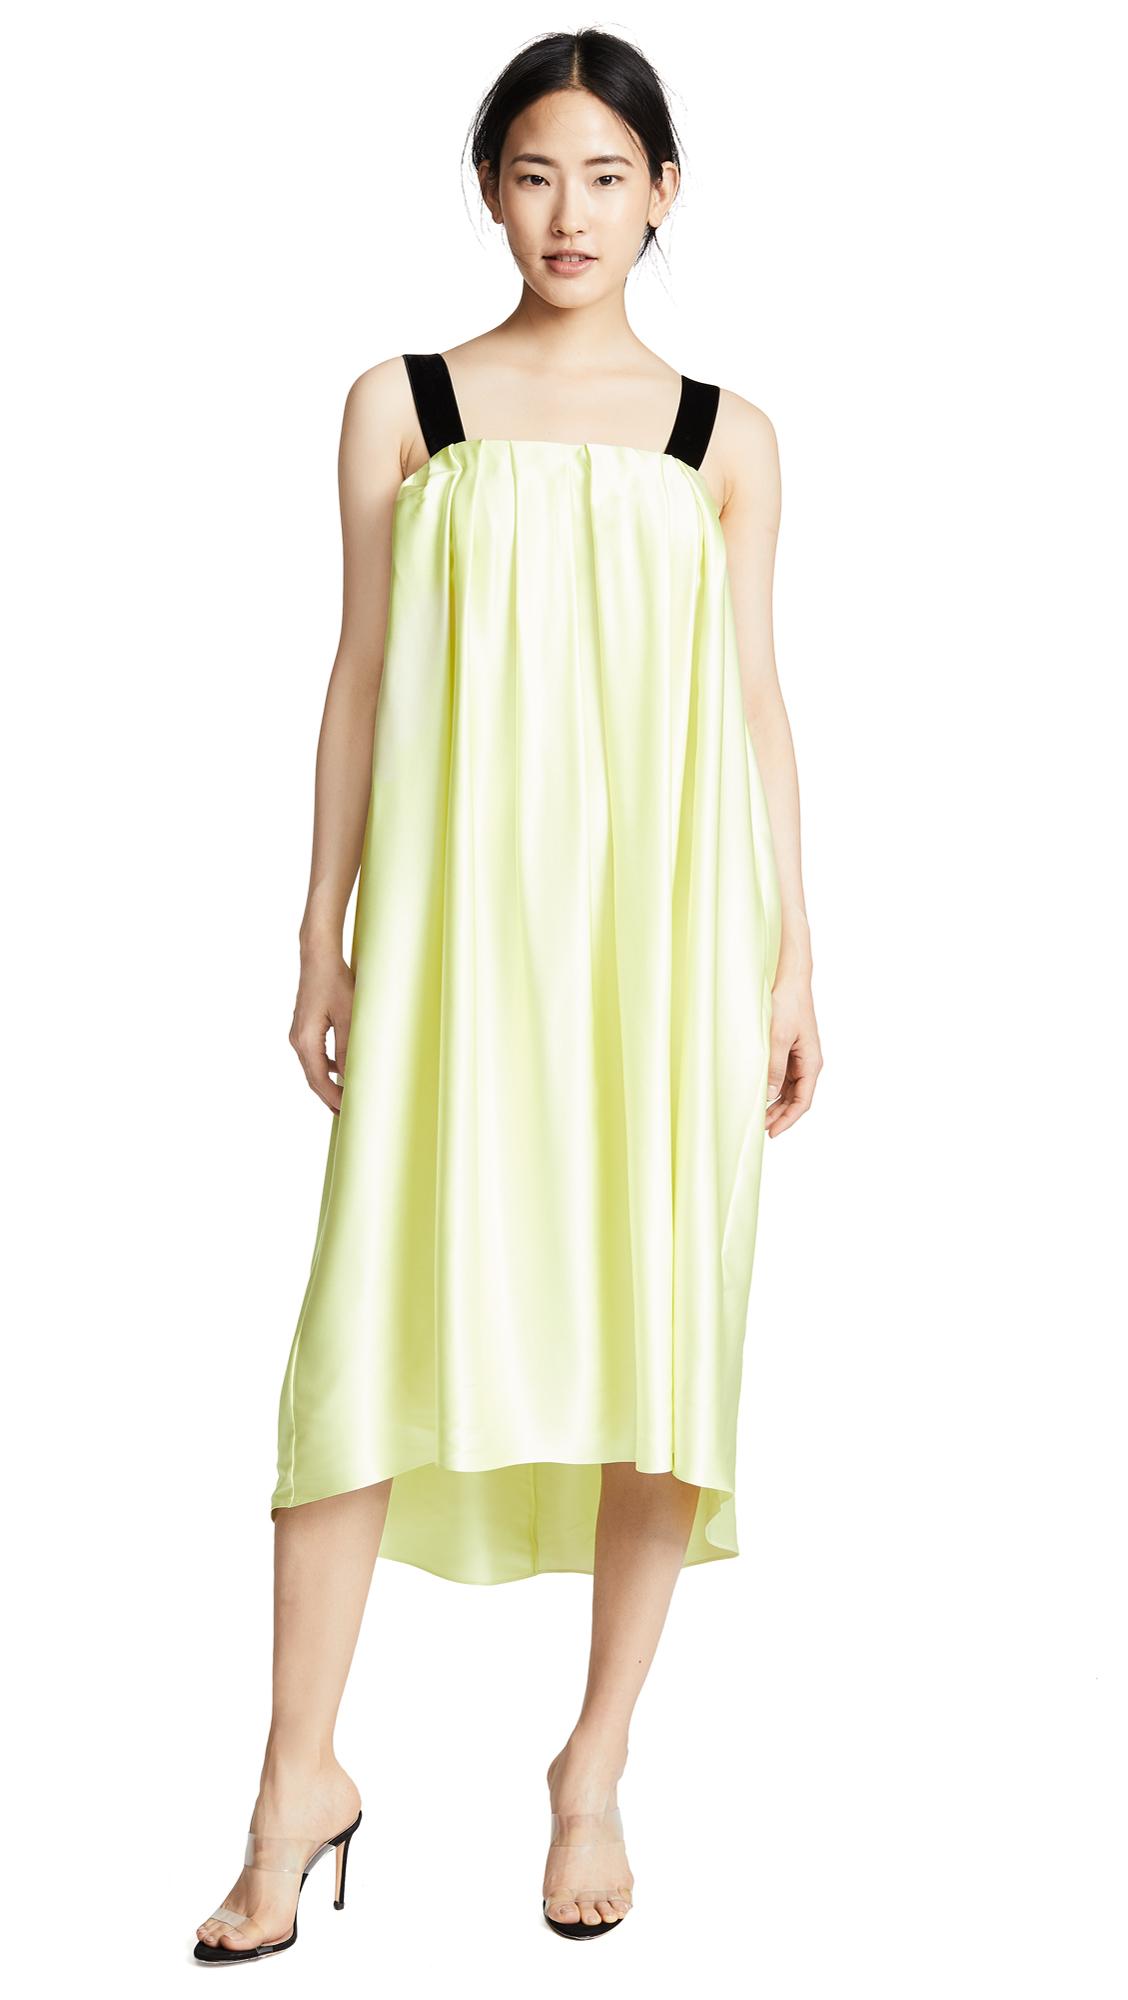 Silk Charmeuse Midi Dress With Velvet Trim in White